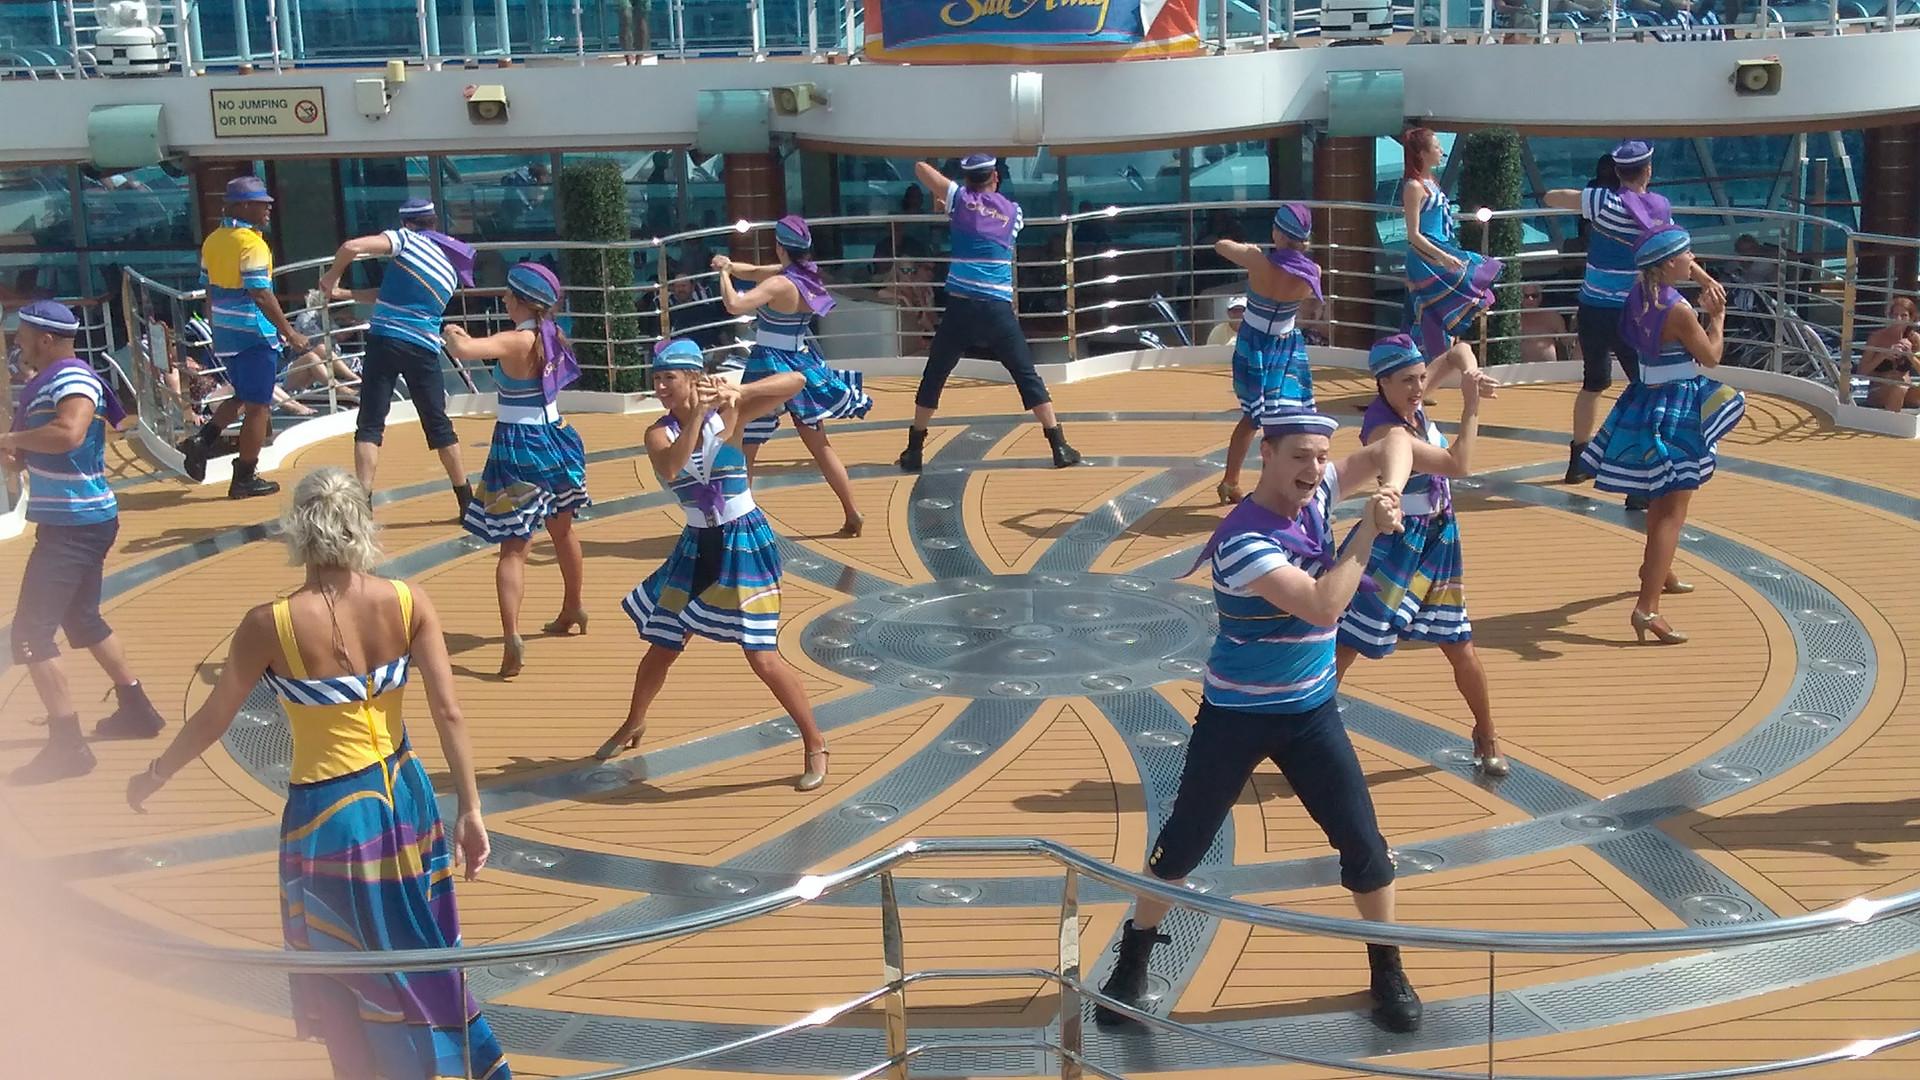 Regal Princess Cruise Lines